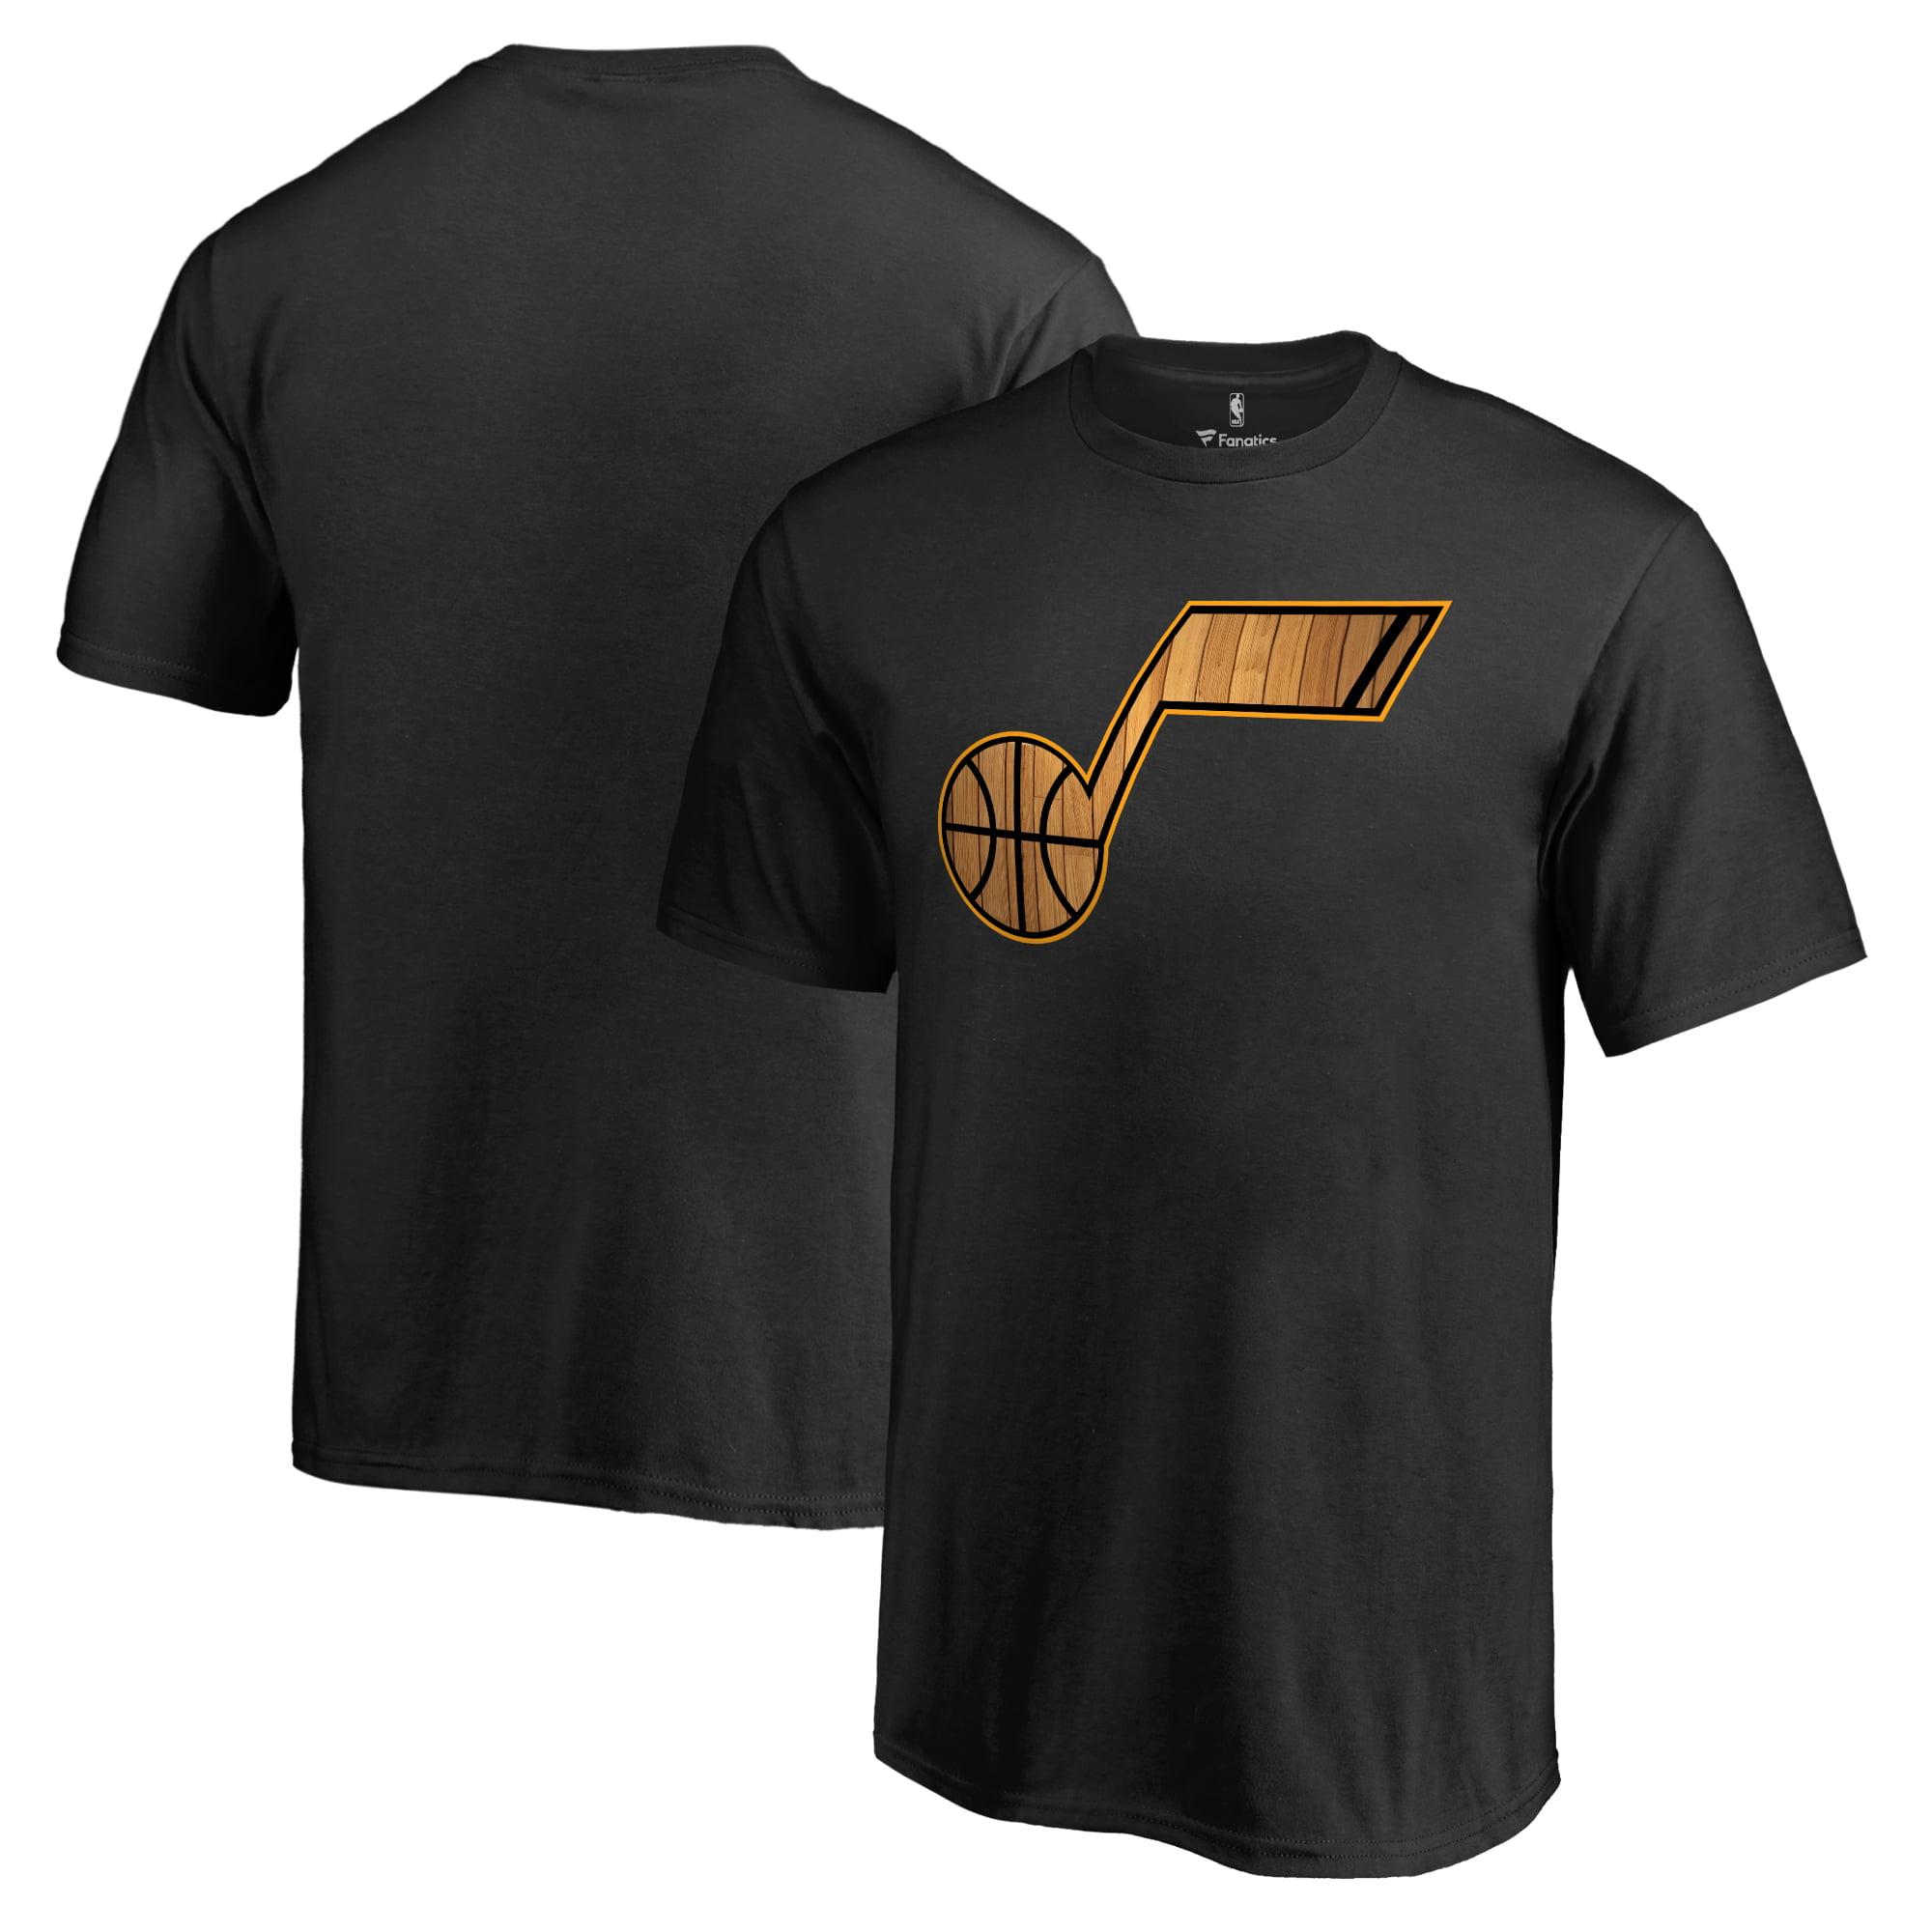 Utah Jazz Youth Hardwood T-Shirt - Black